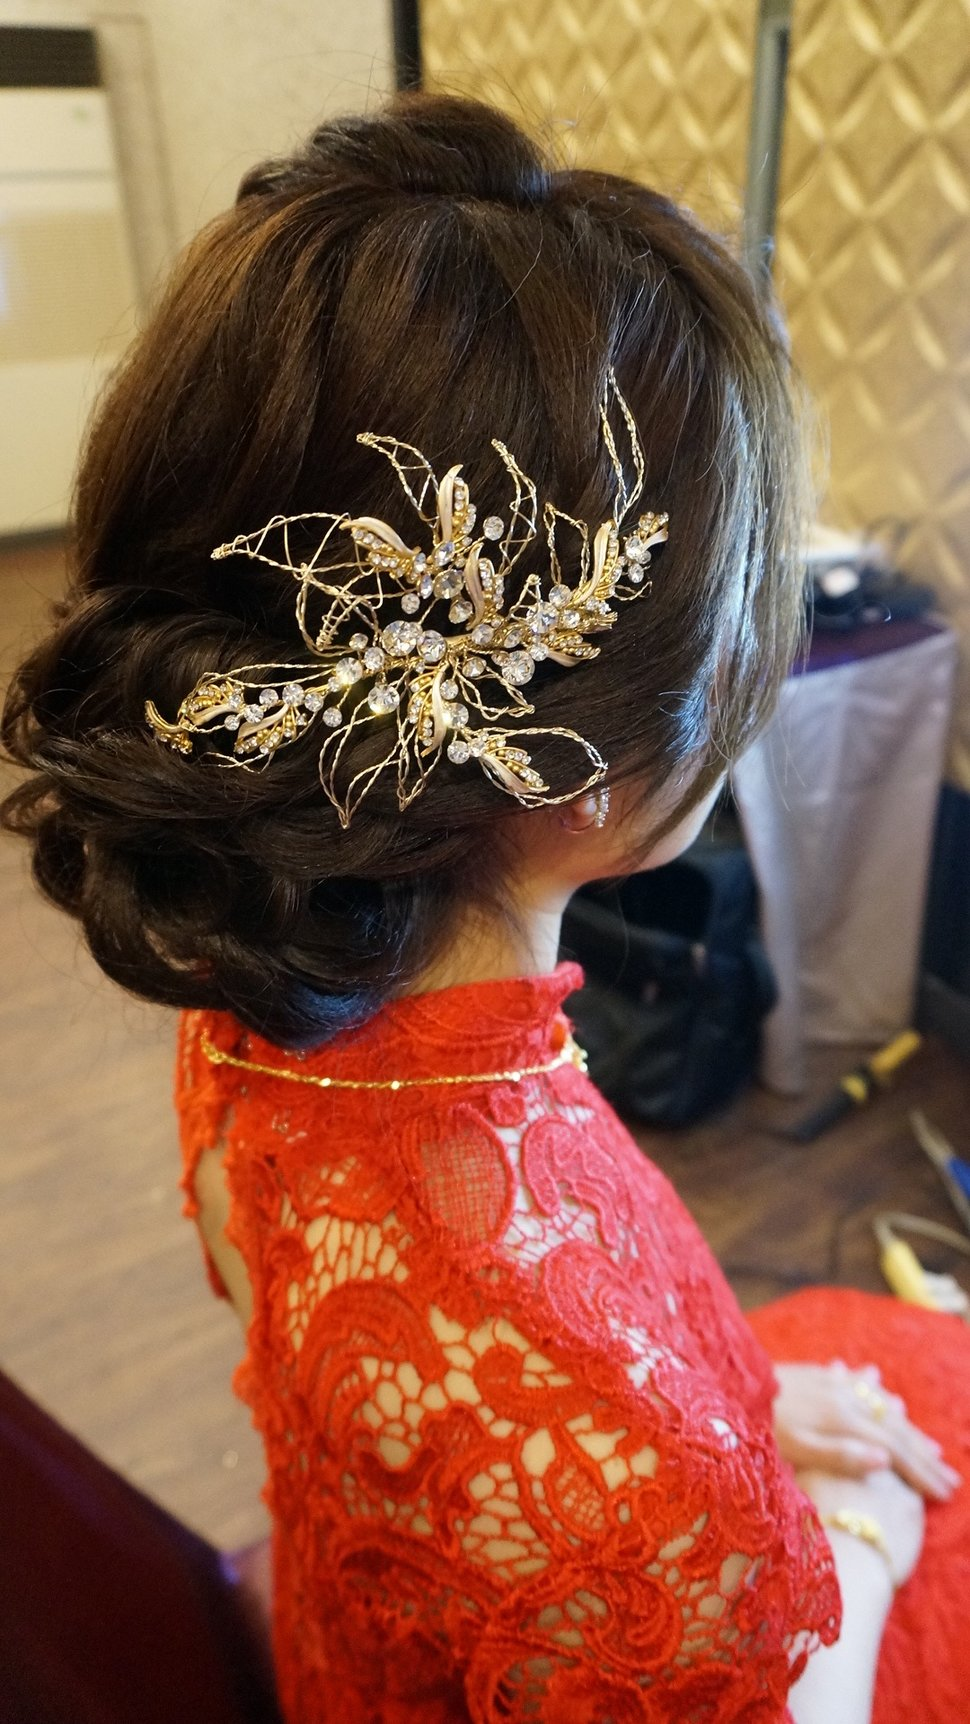 IMG_0610 - Kate忻宜 - 結婚吧